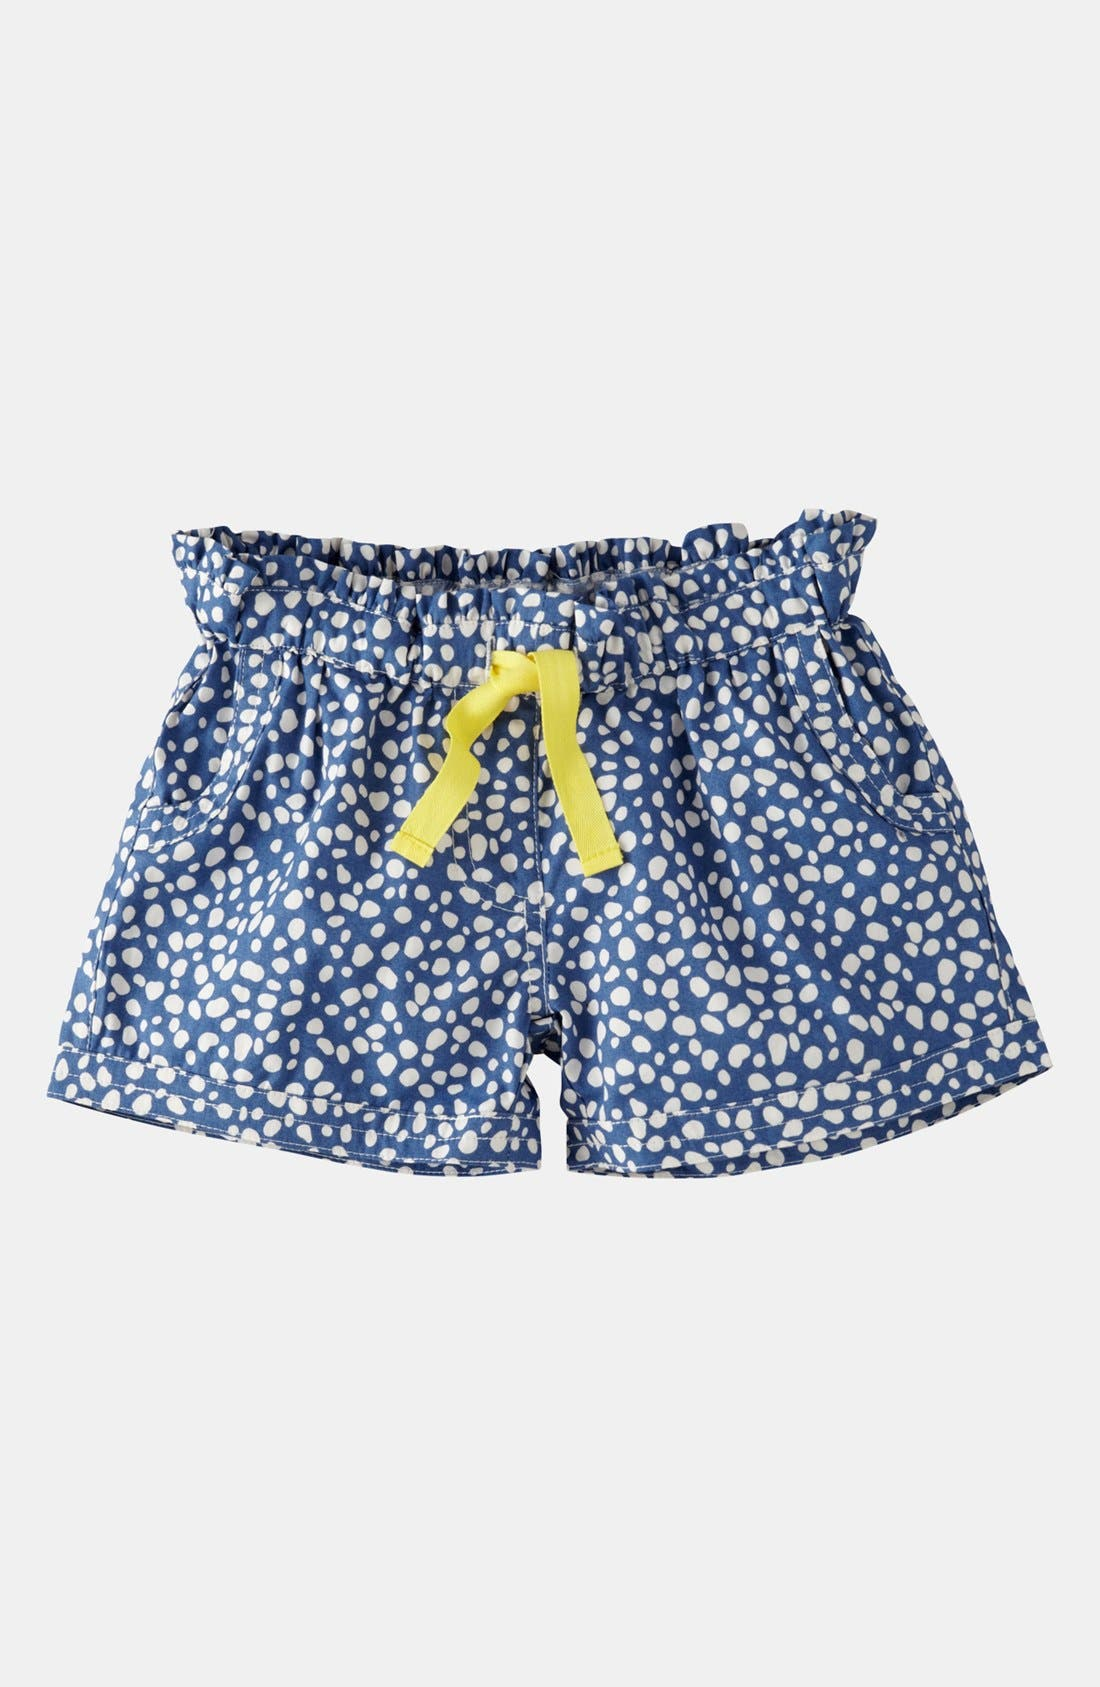 Main Image - Mini Boden 'Spotty Holiday' Shorts (Toddler)